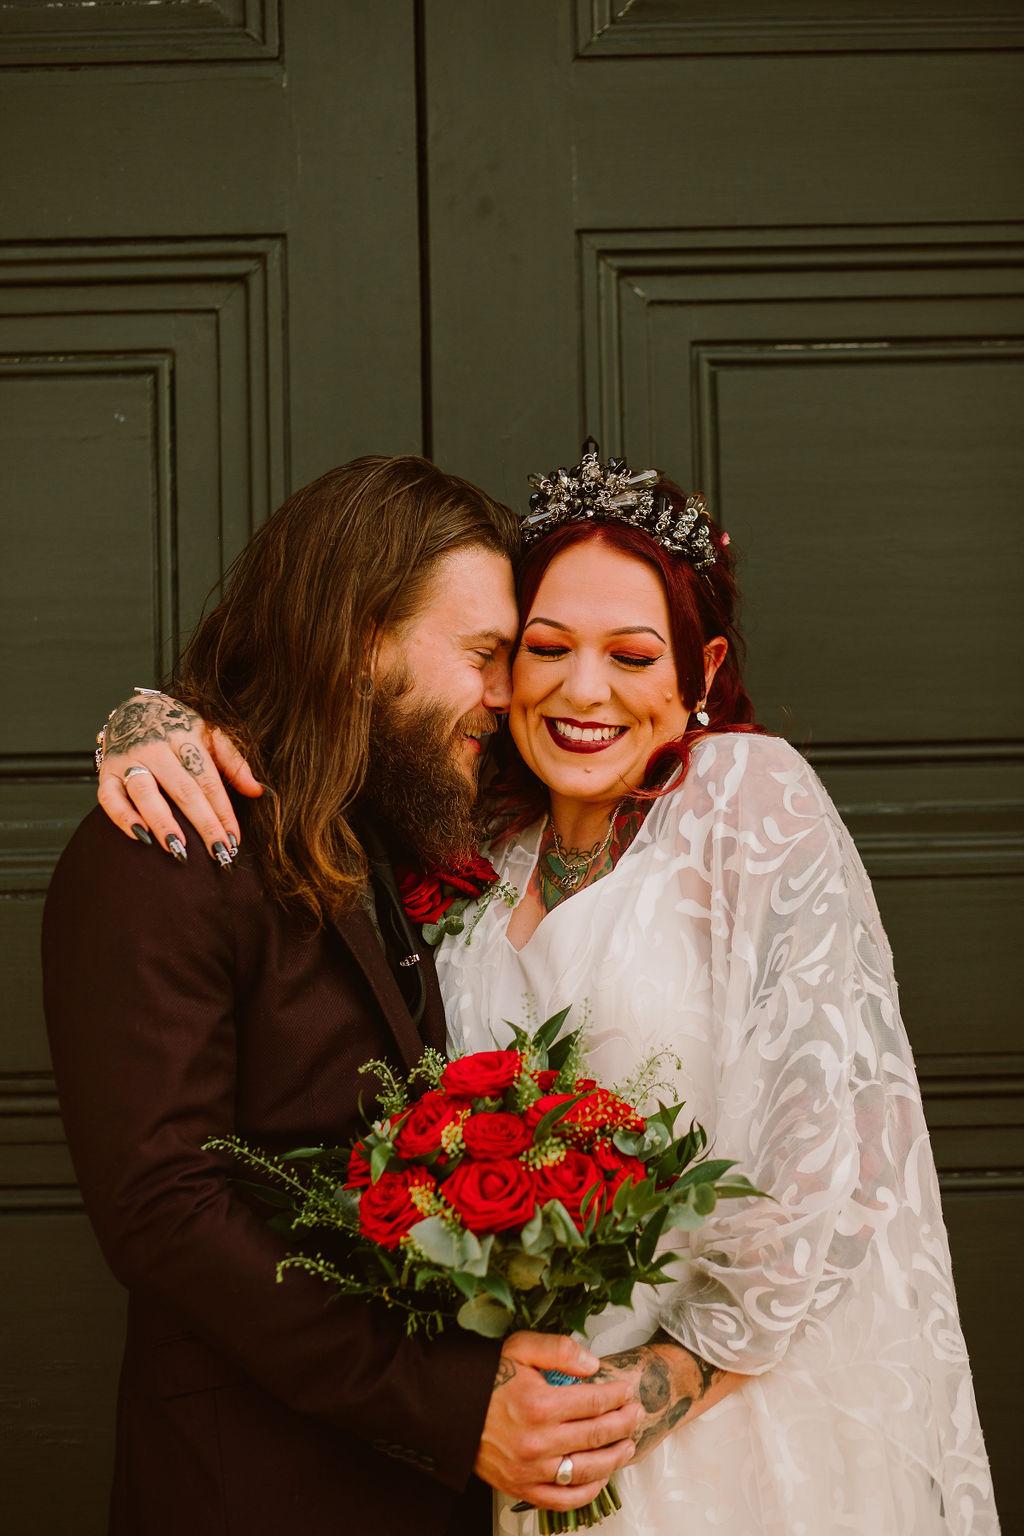 alternative wedding photography - bride and groom smiling